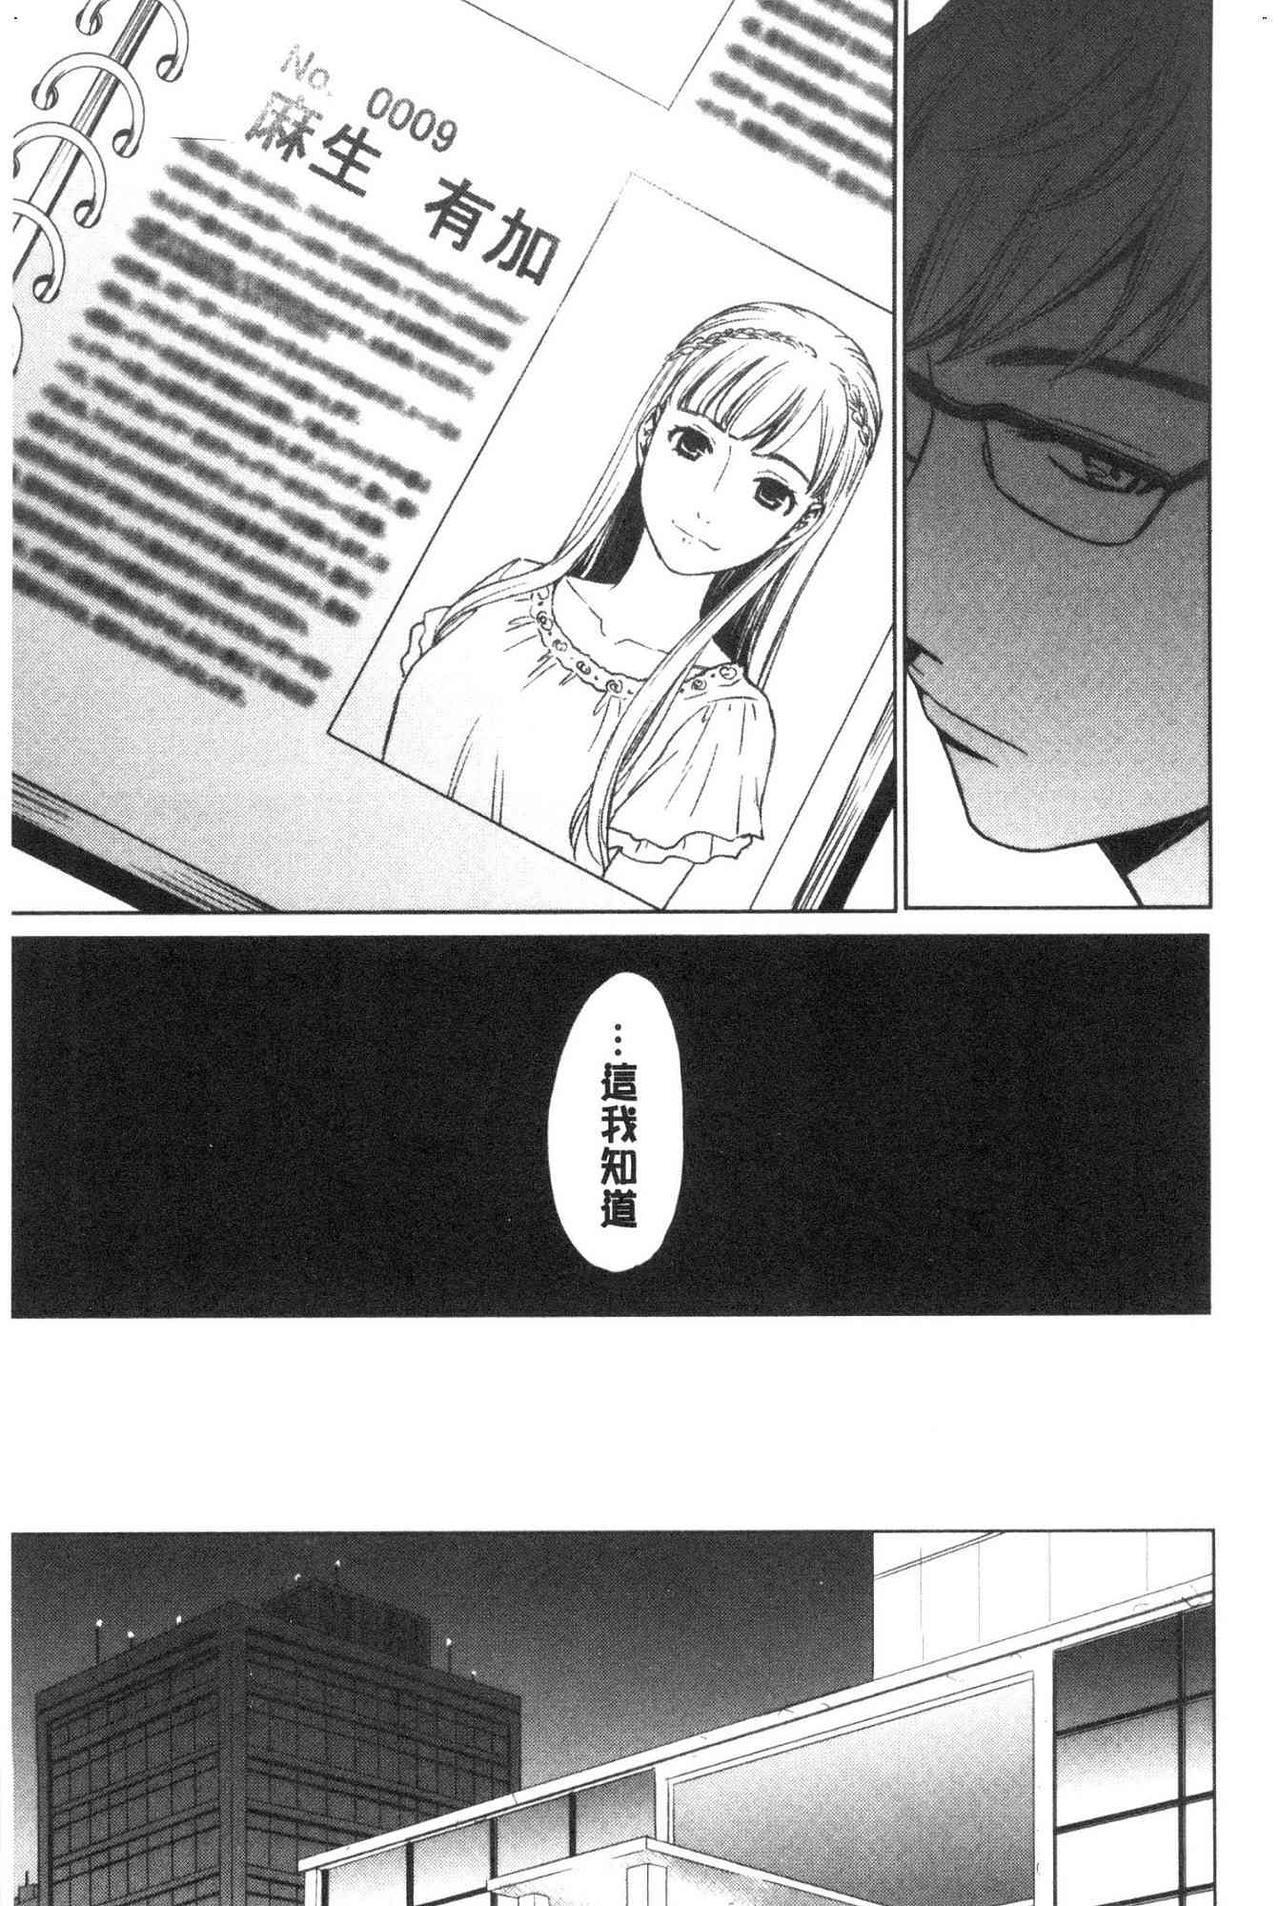 [Gotoh Akira]  21-ji no Onna ~Camera no Mae no Mesuinu~ 2 | 21時之女 ~鏡頭前的牝犬~ 2 [Chinese] 142